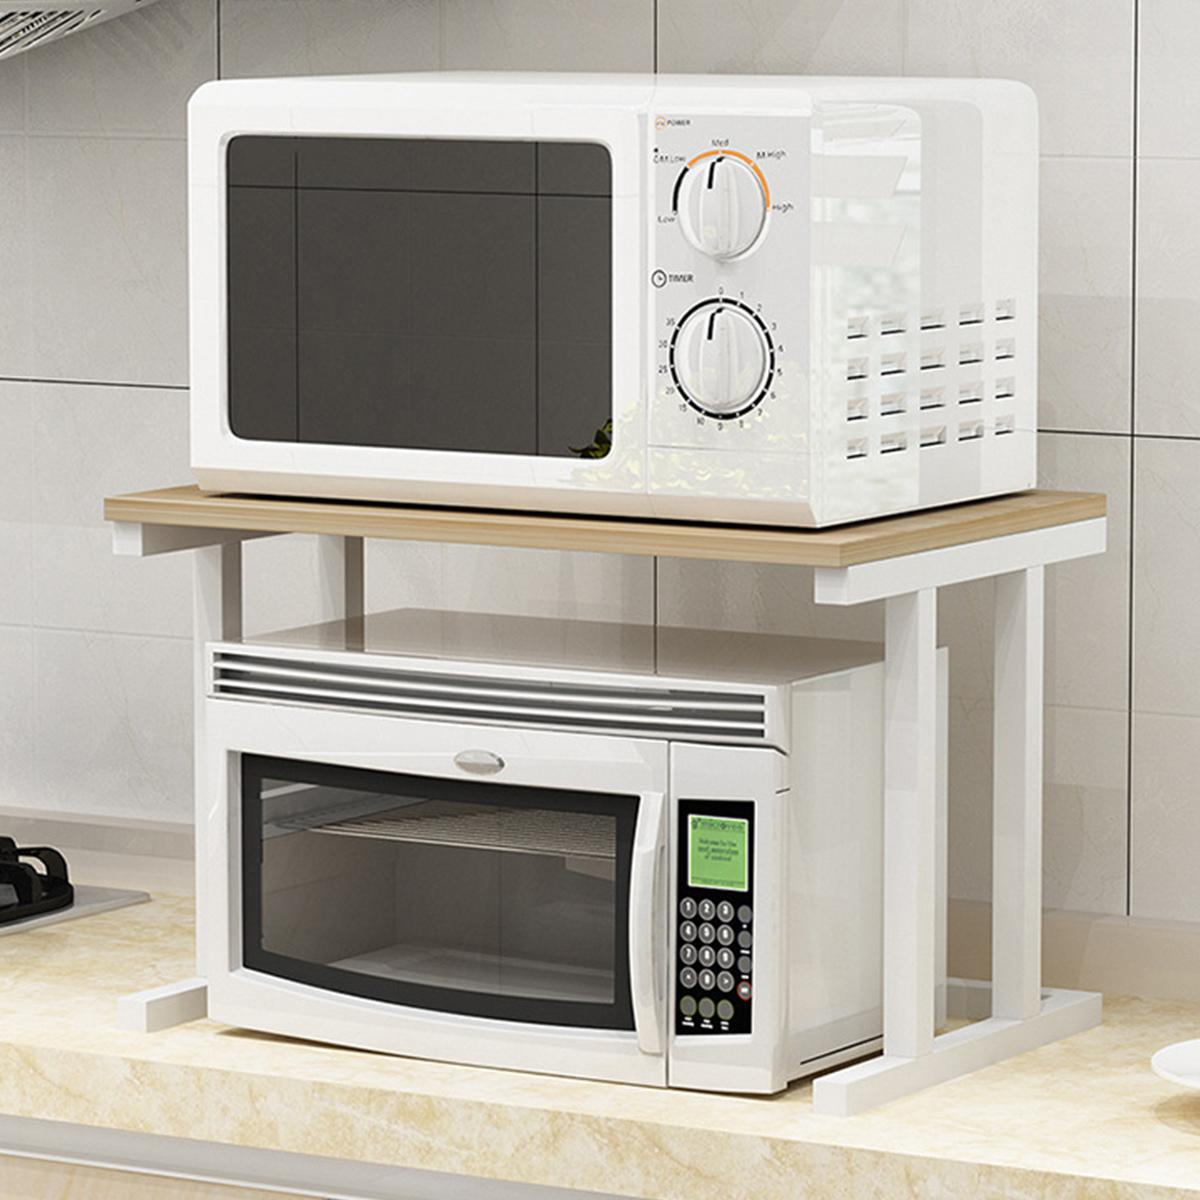 white 6 hooks 2 tier microwave kitchen storage shelf rack oven stand wood bracket